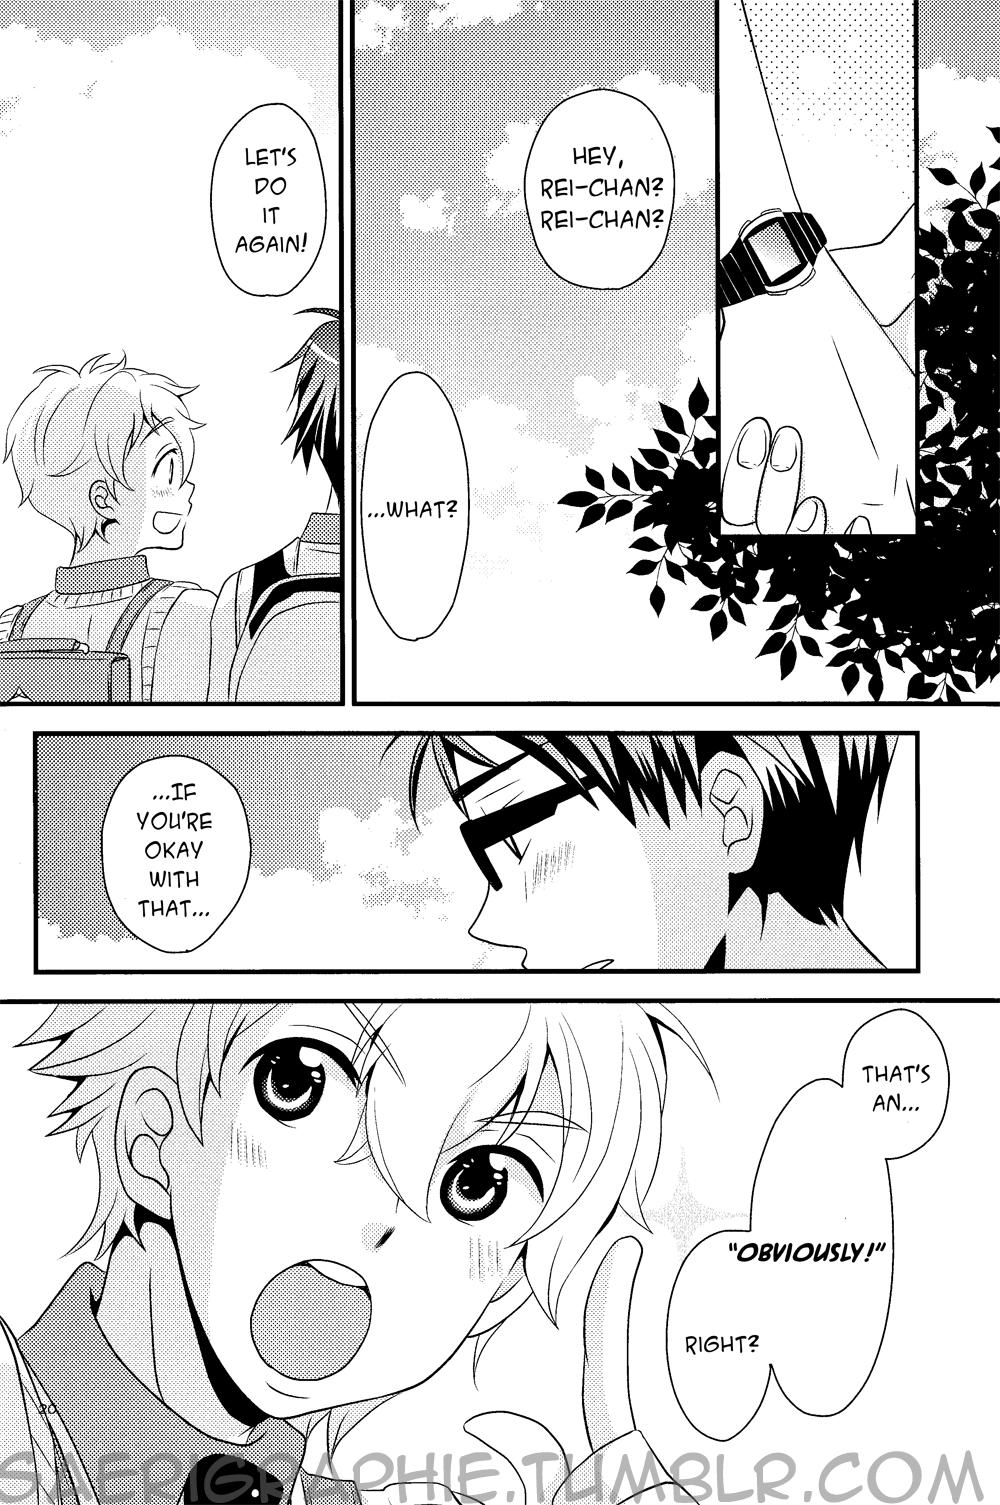 Koibito ga Akogare no Senpai wo Suki Sugite Tsurai | It's Hard When Your Boyfriend Likes an Upperclassman He Admires Too Much 19